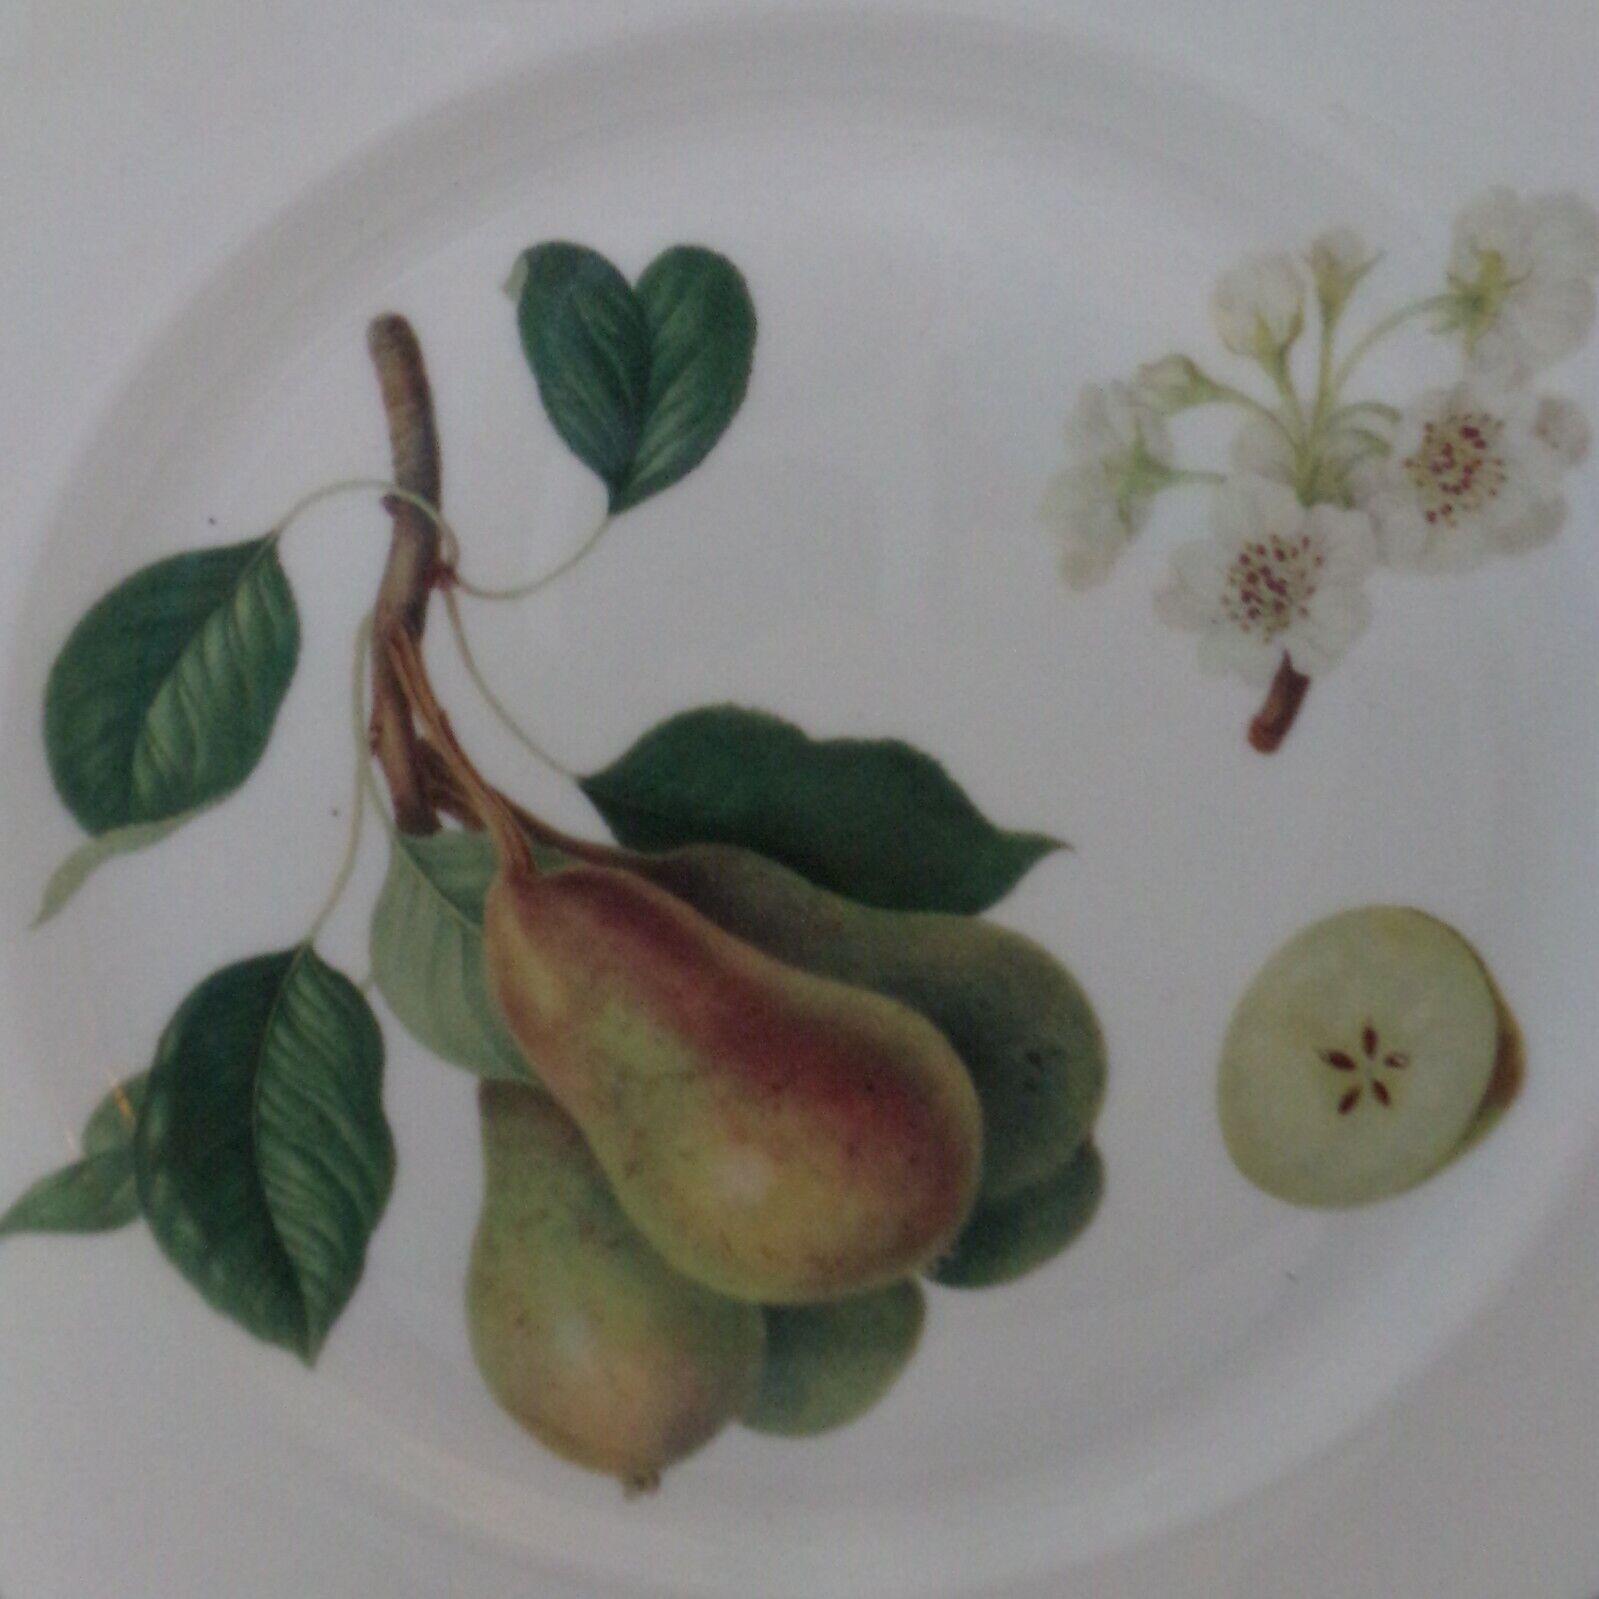 Rosina-Queen s Hooker s Fruit 8.5 Salad Plate Pear Flower Bone-China - $8.00